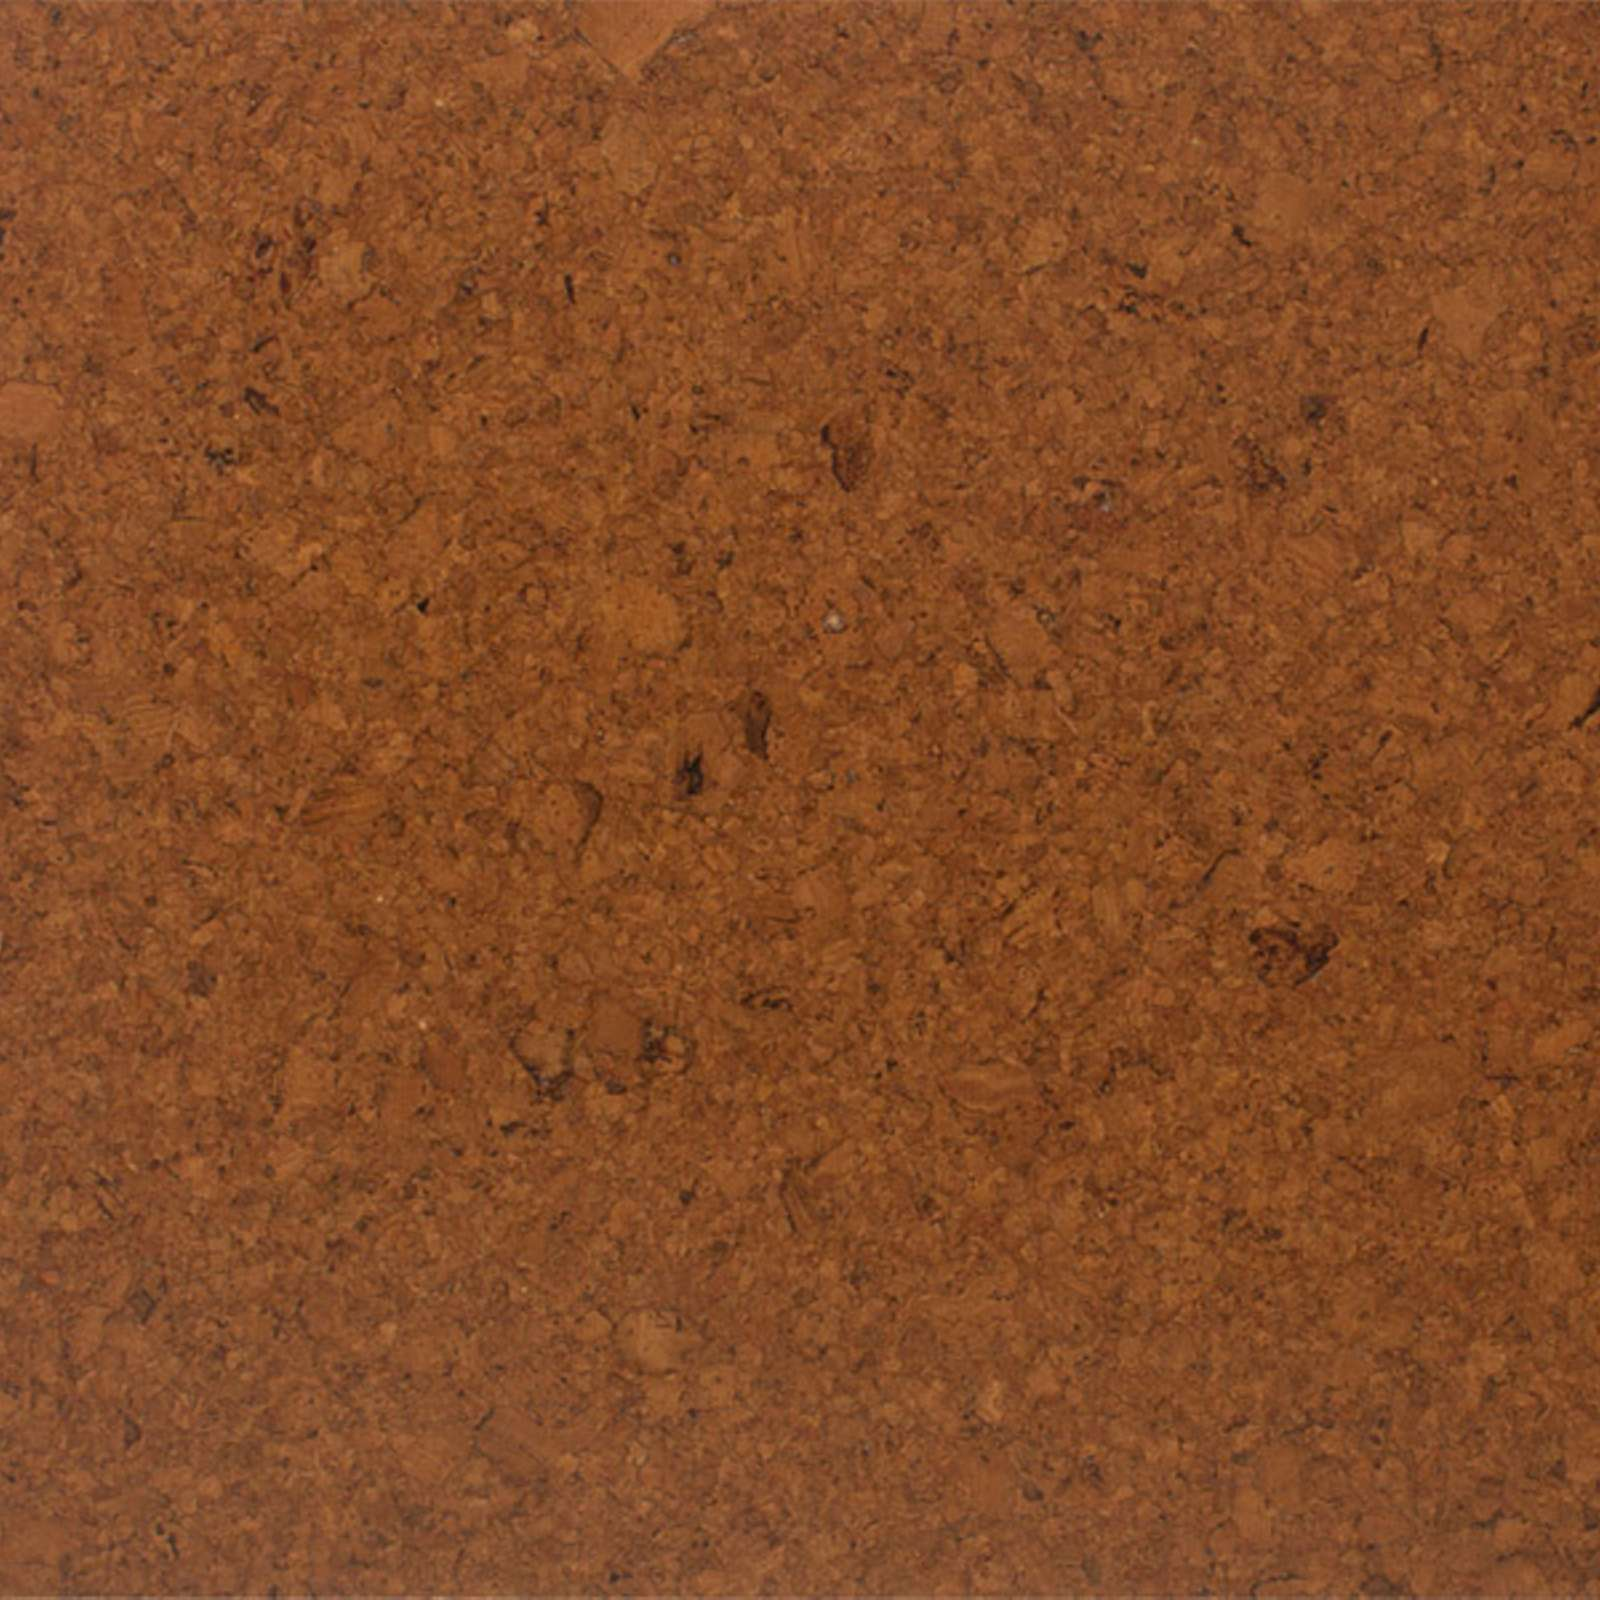 MJO 8.5 Athene Brown